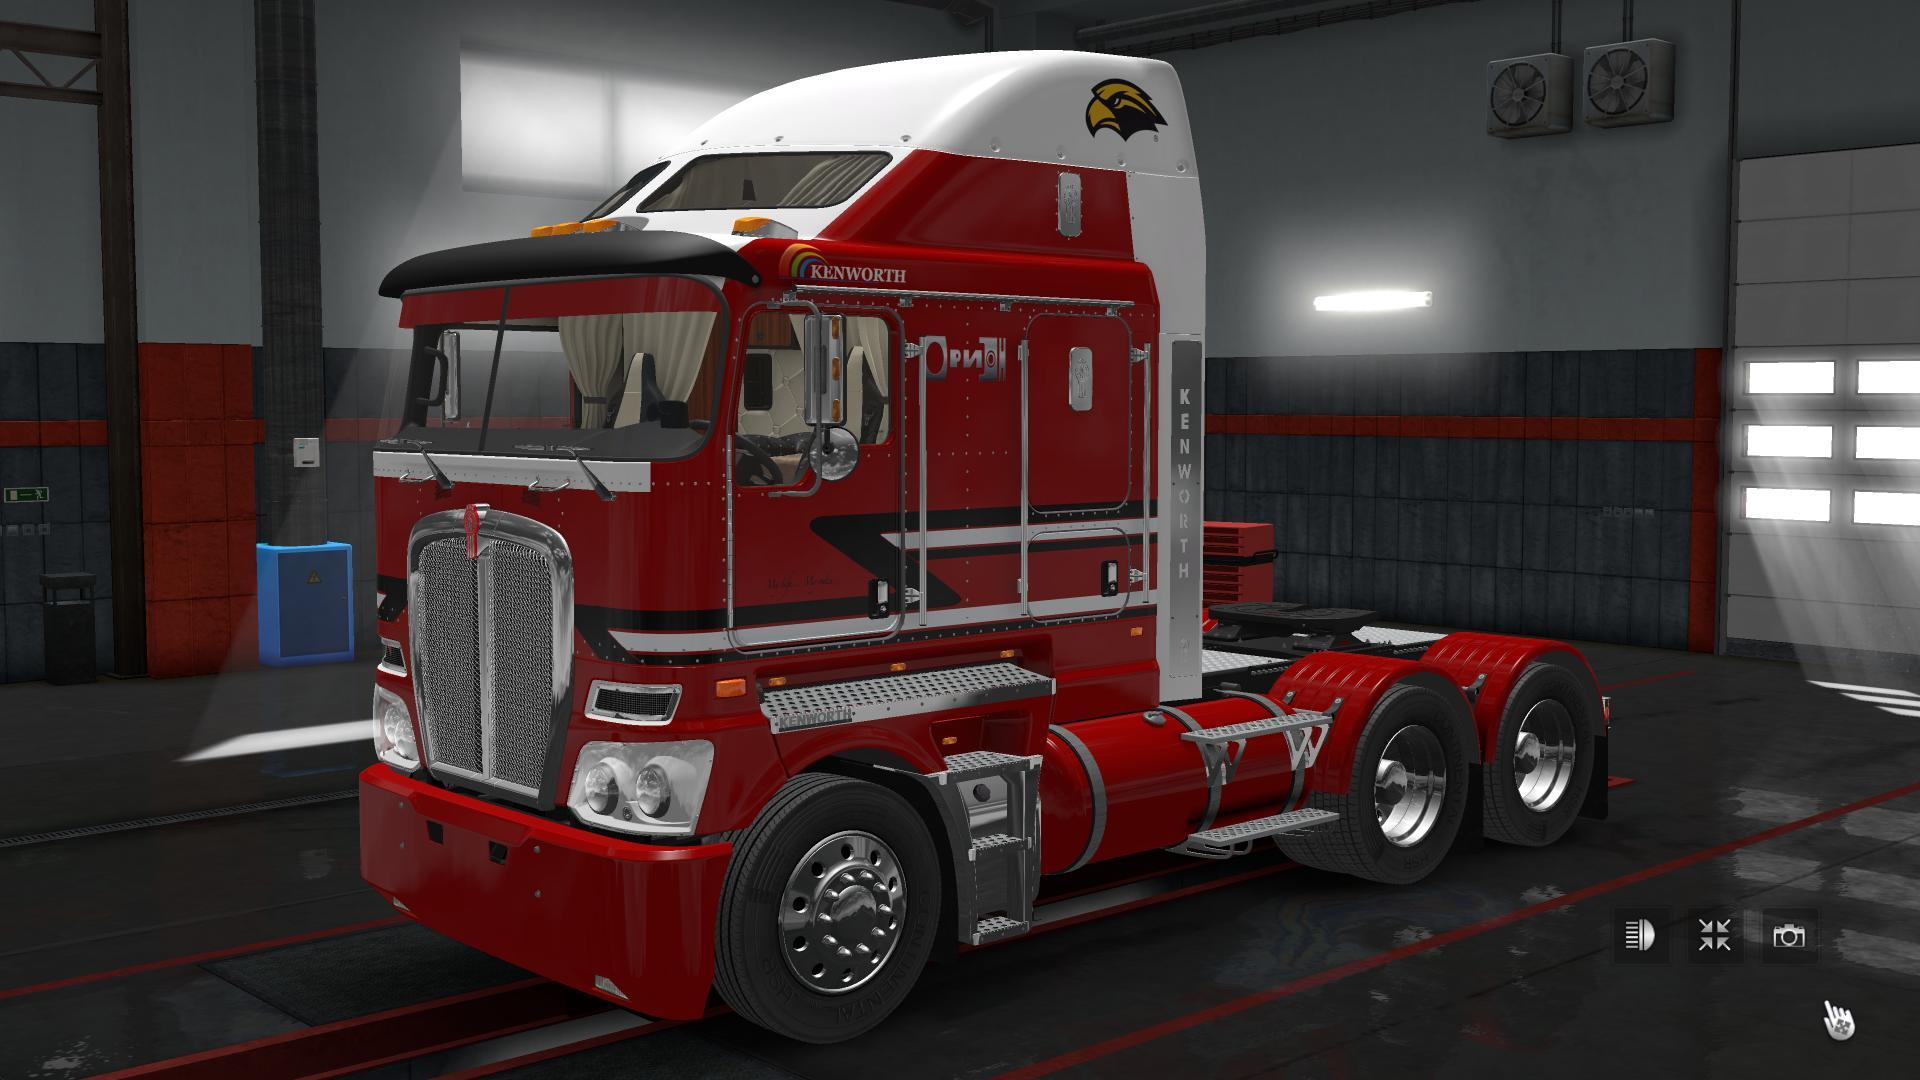 Kenworth K200 Orion Truck Skin 1 30